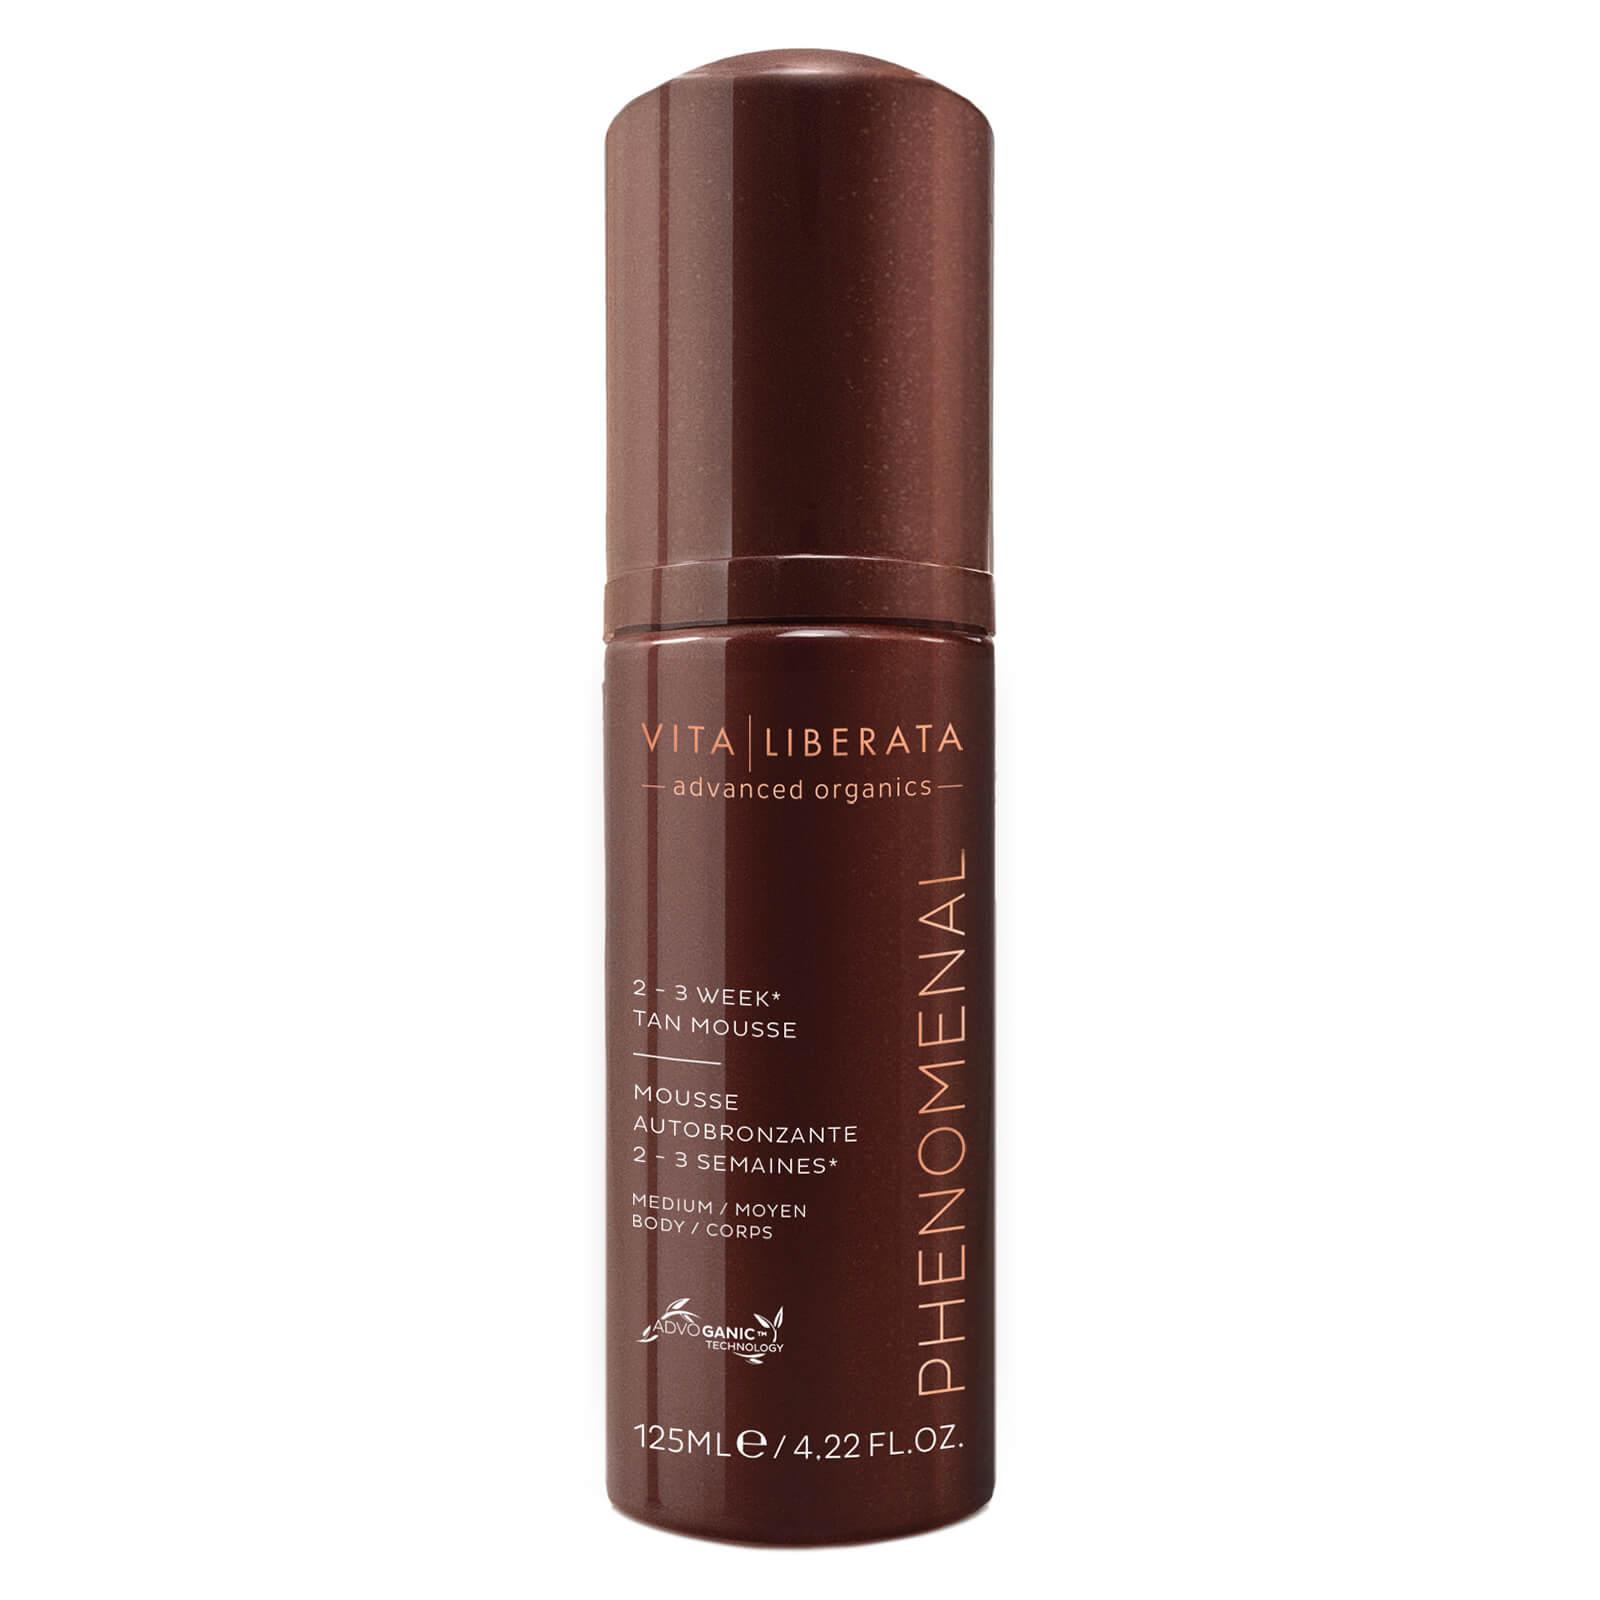 Феноменальный мусс-автозагар Vita Liberata pHenomenal 2-3 Week Tan - Medium - 125 мл  - Купить